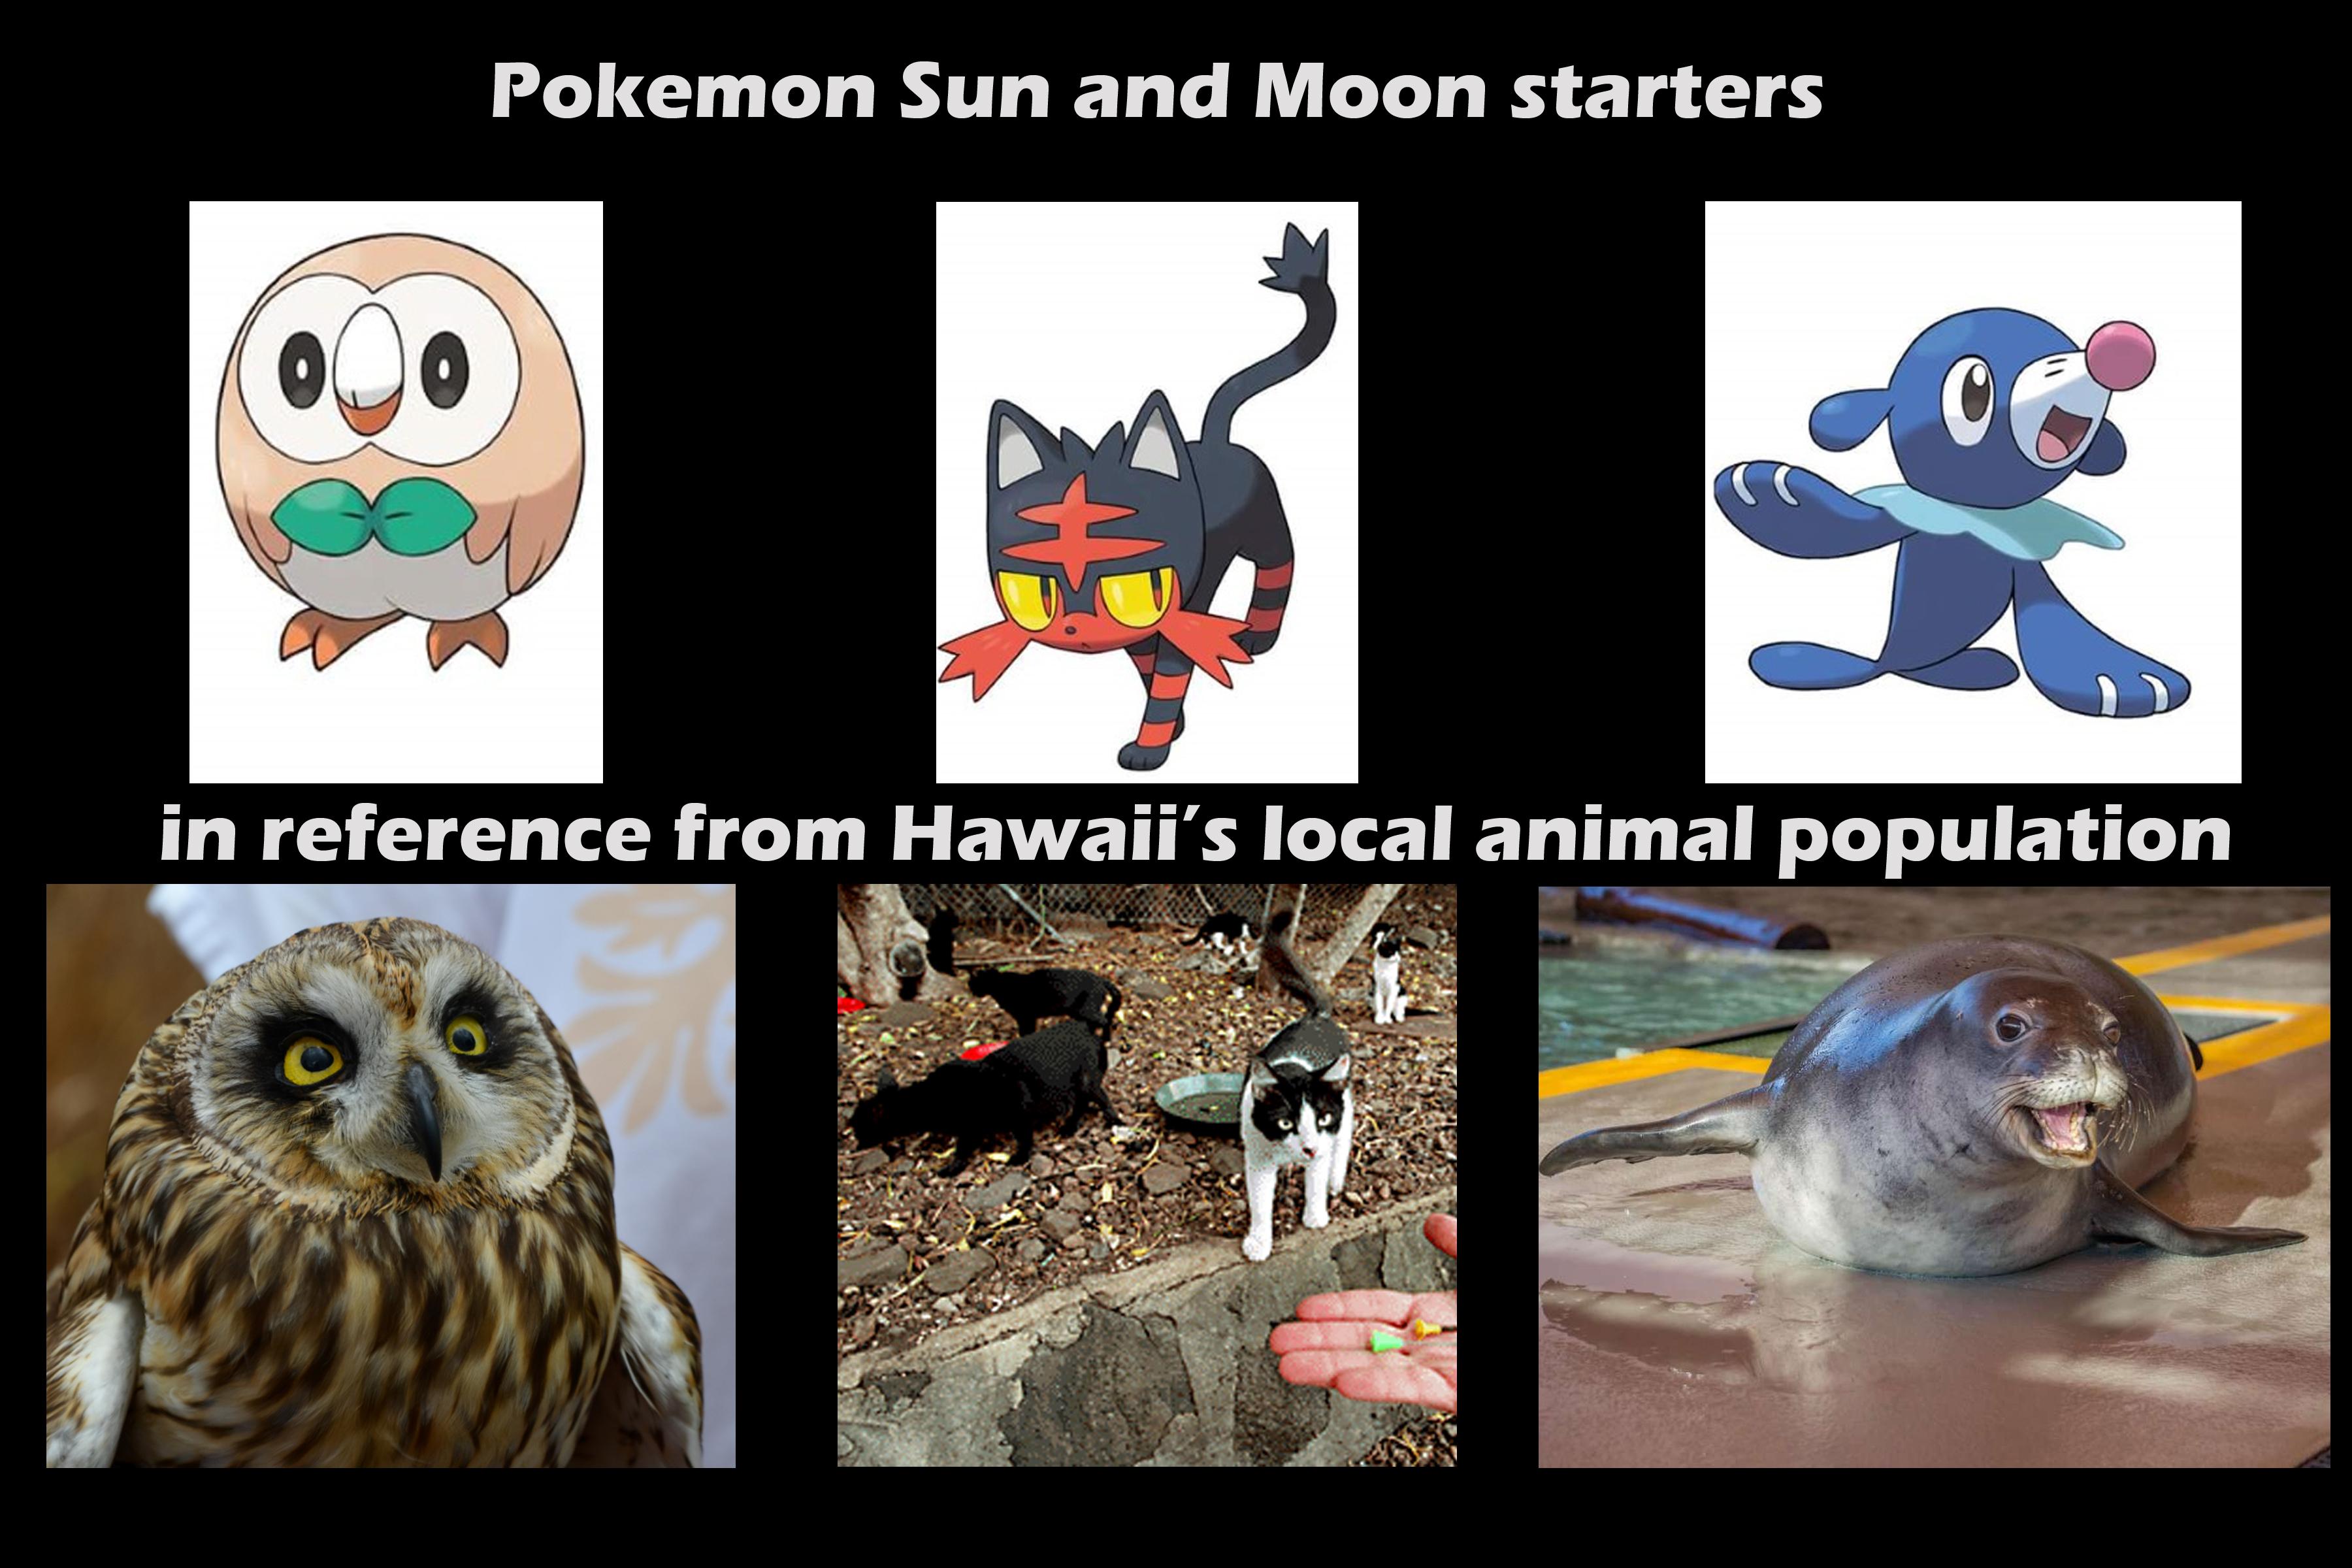 19 Funniest Pokemon Sun And Moon Meme Pictures | MemesBoy